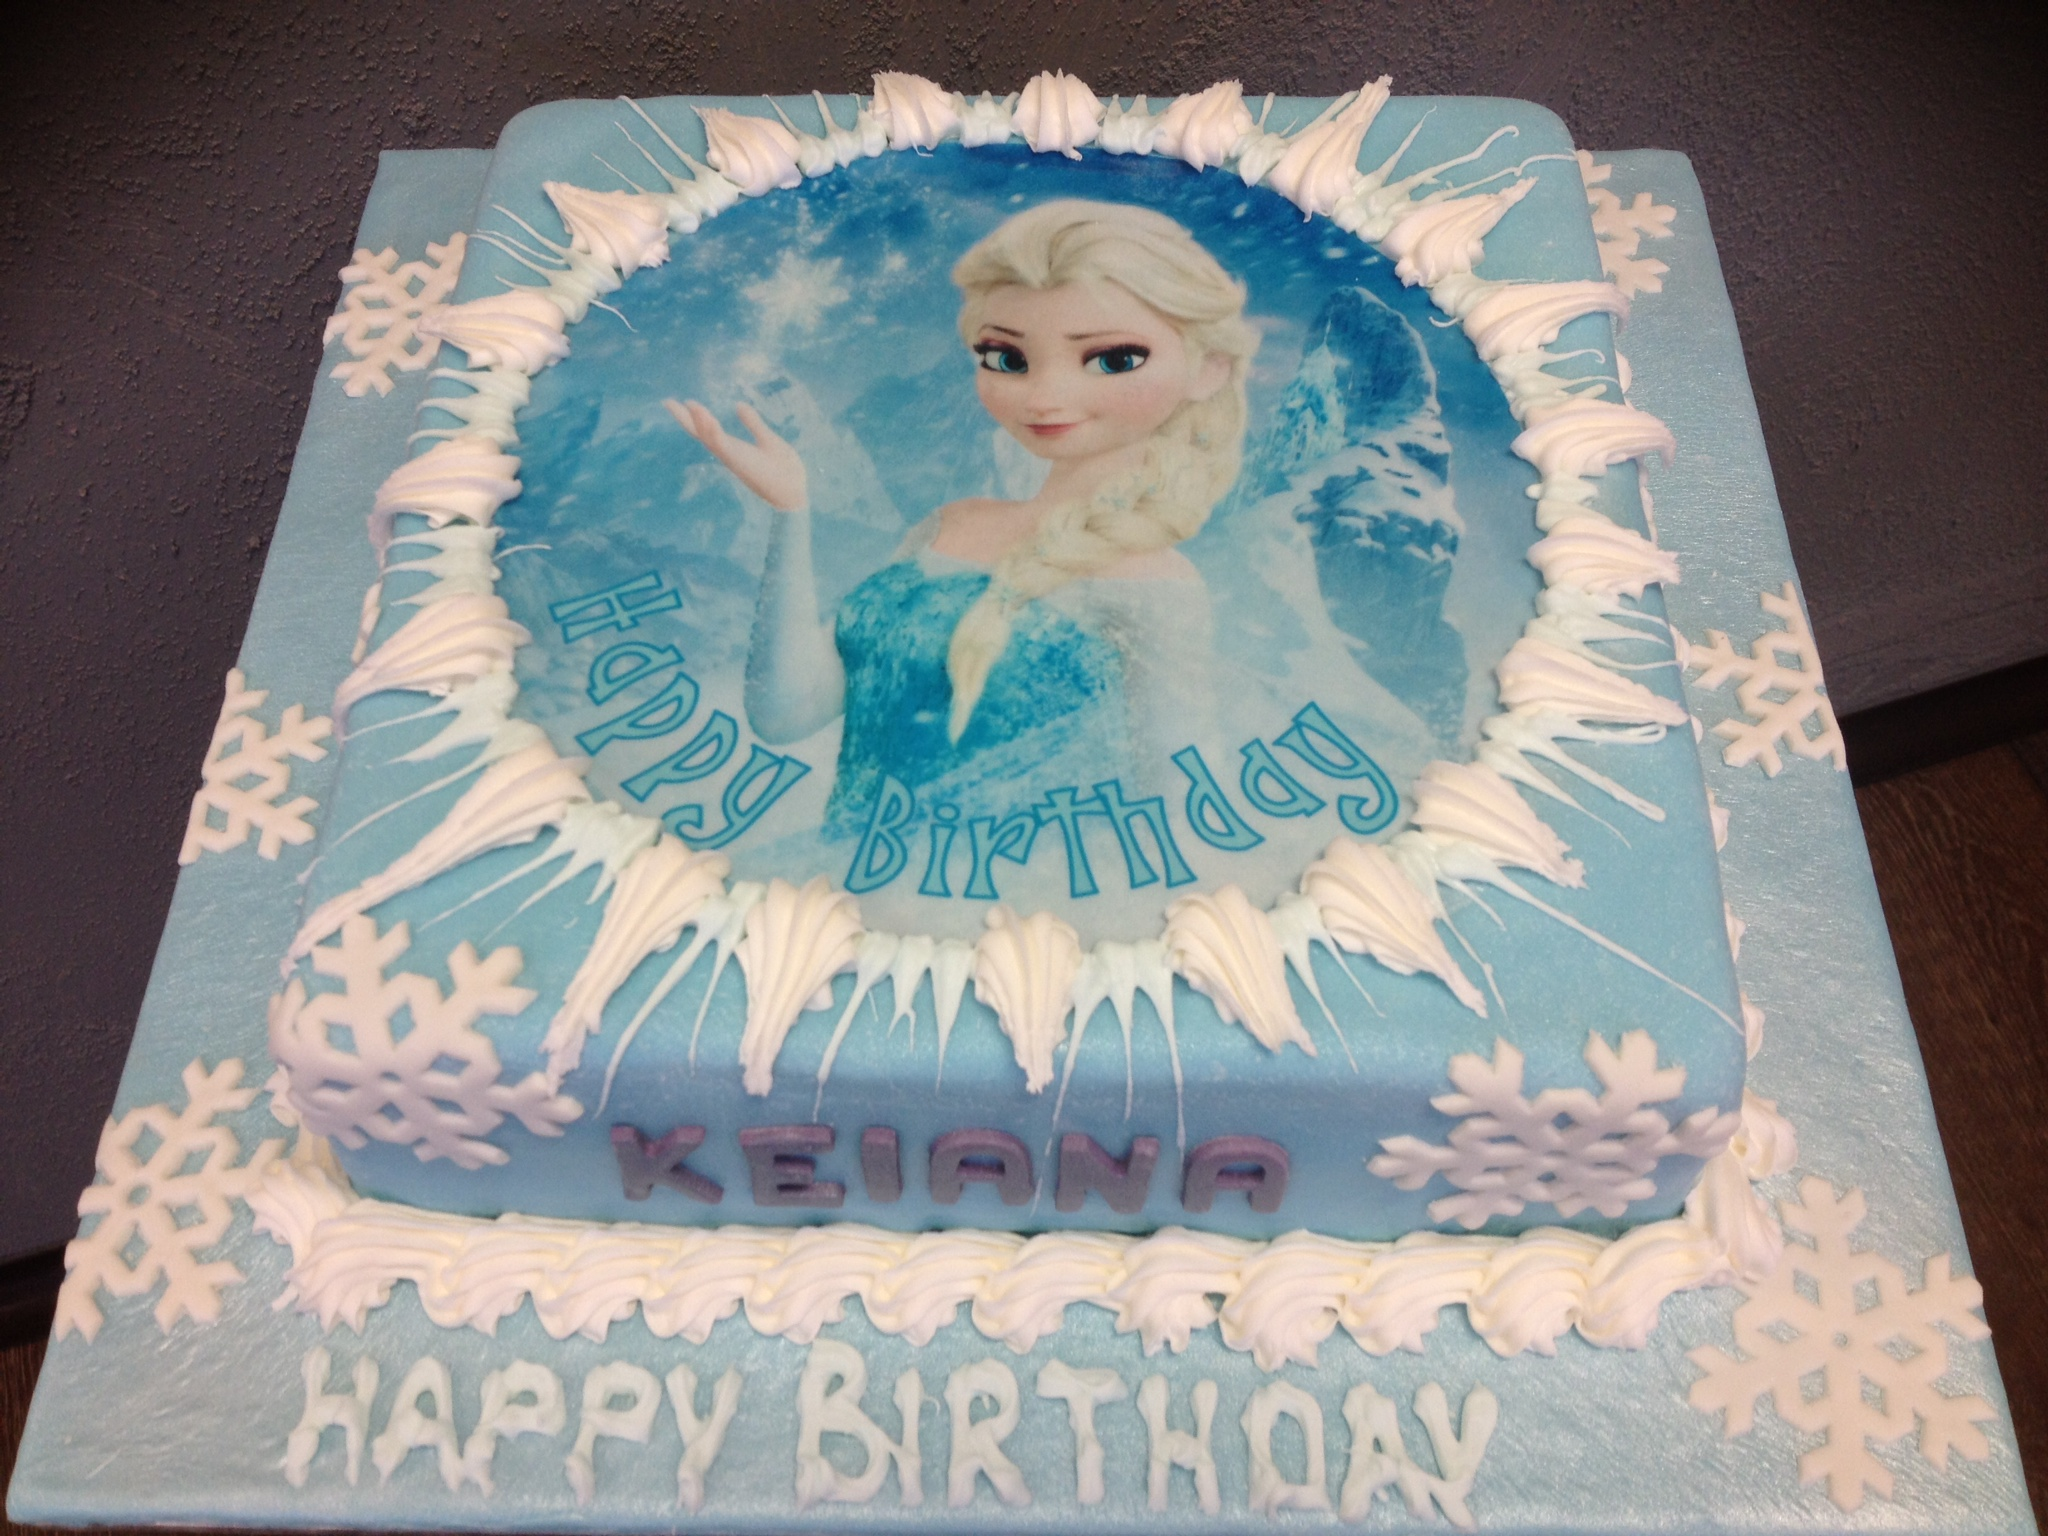 Queen Elsa Cake Design : Queen Elsa Birthday Cake images